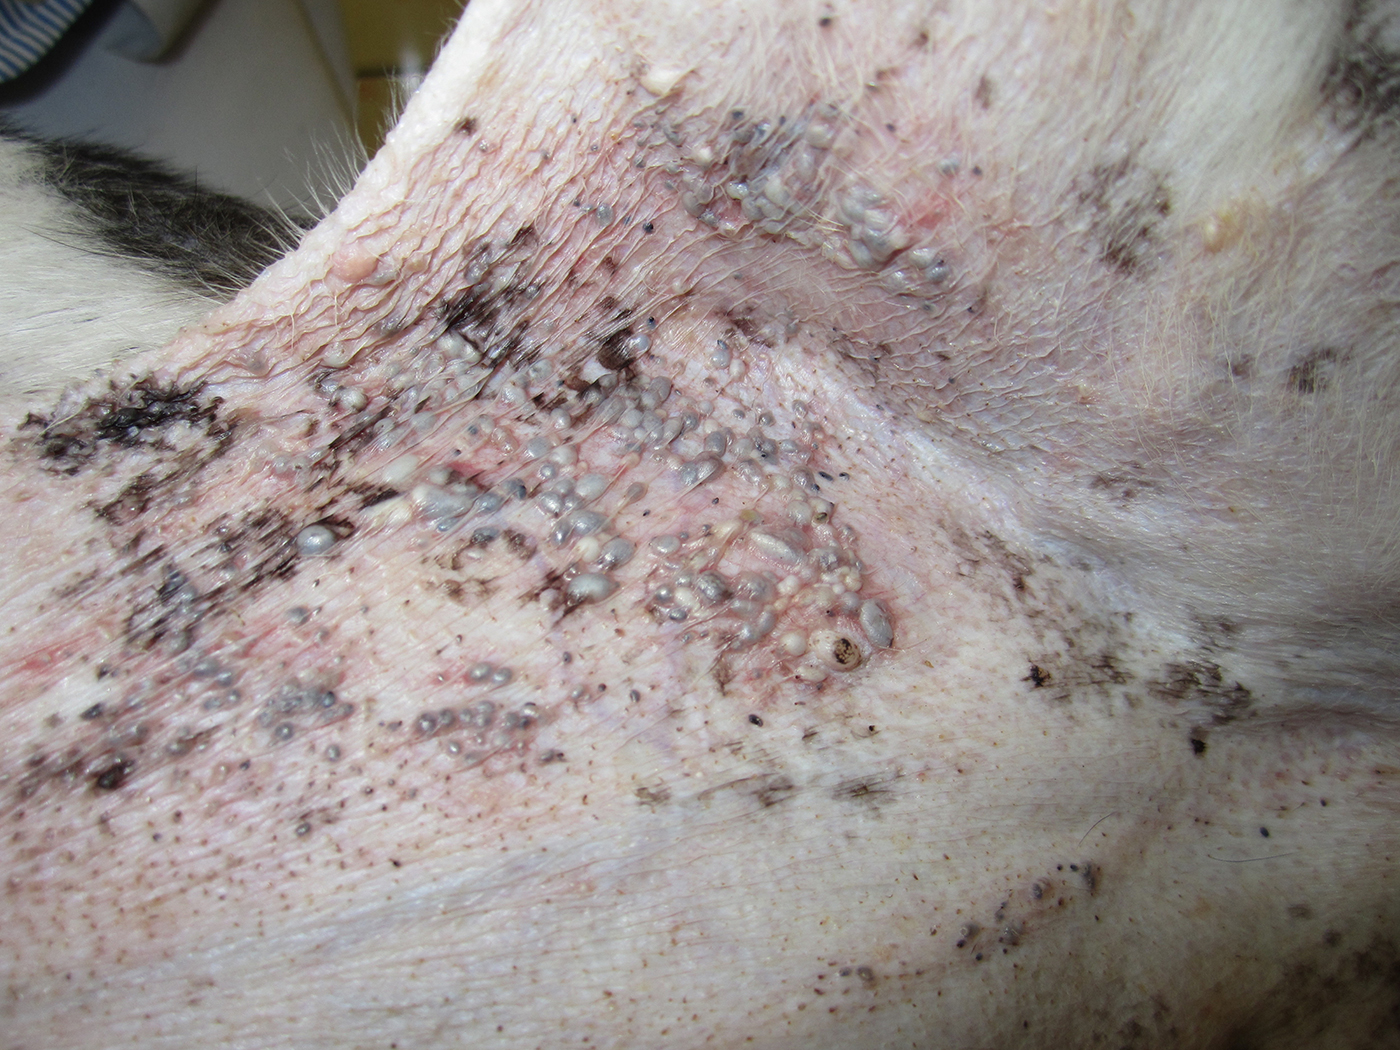 Image Gallery: Common Skin Masses | Clinician's Brief